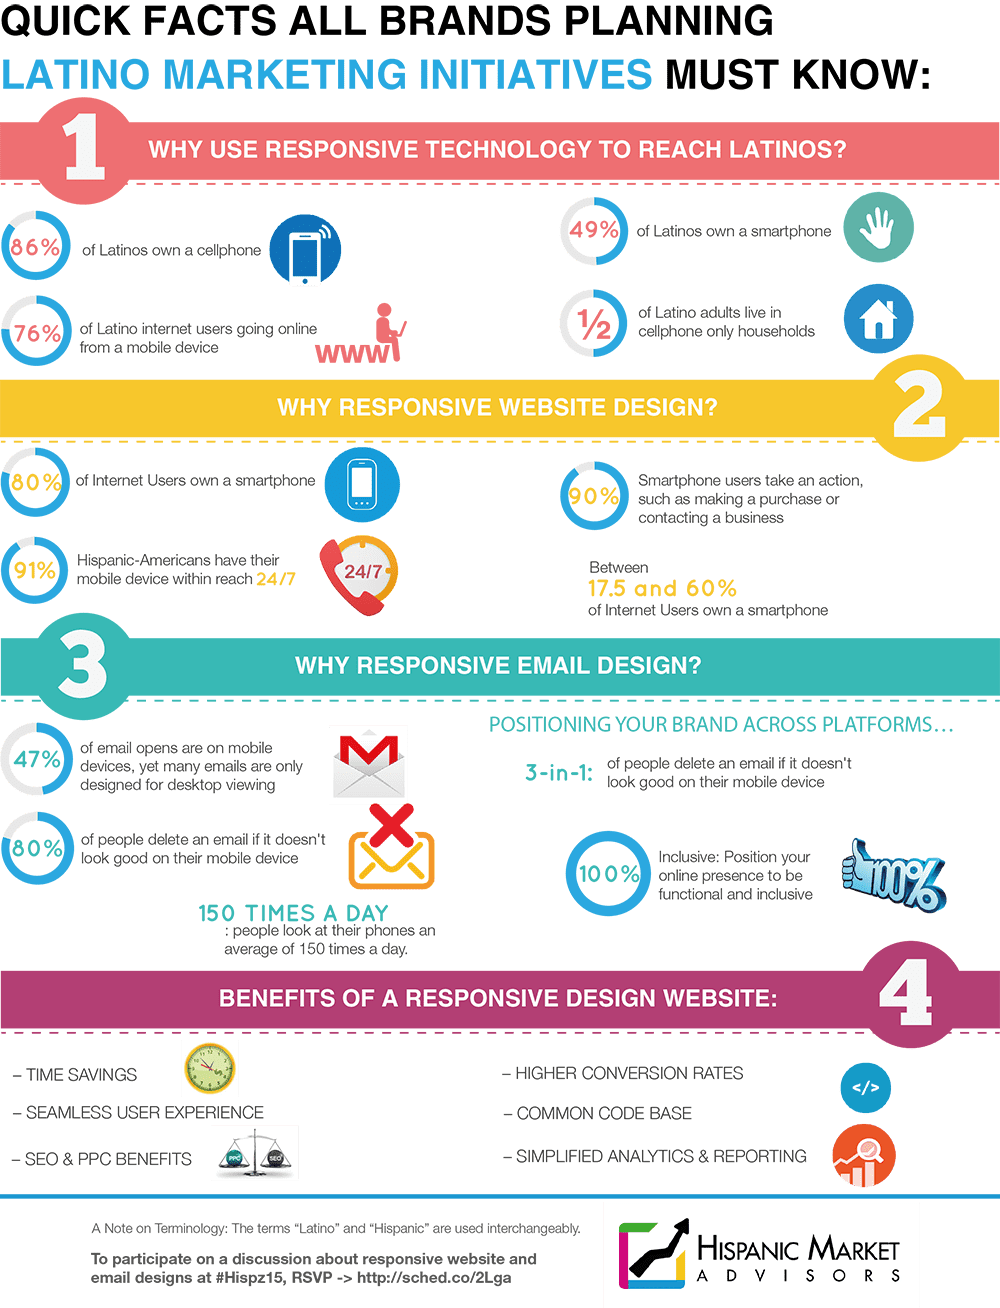 Infographic Latino Marketing Initiatives